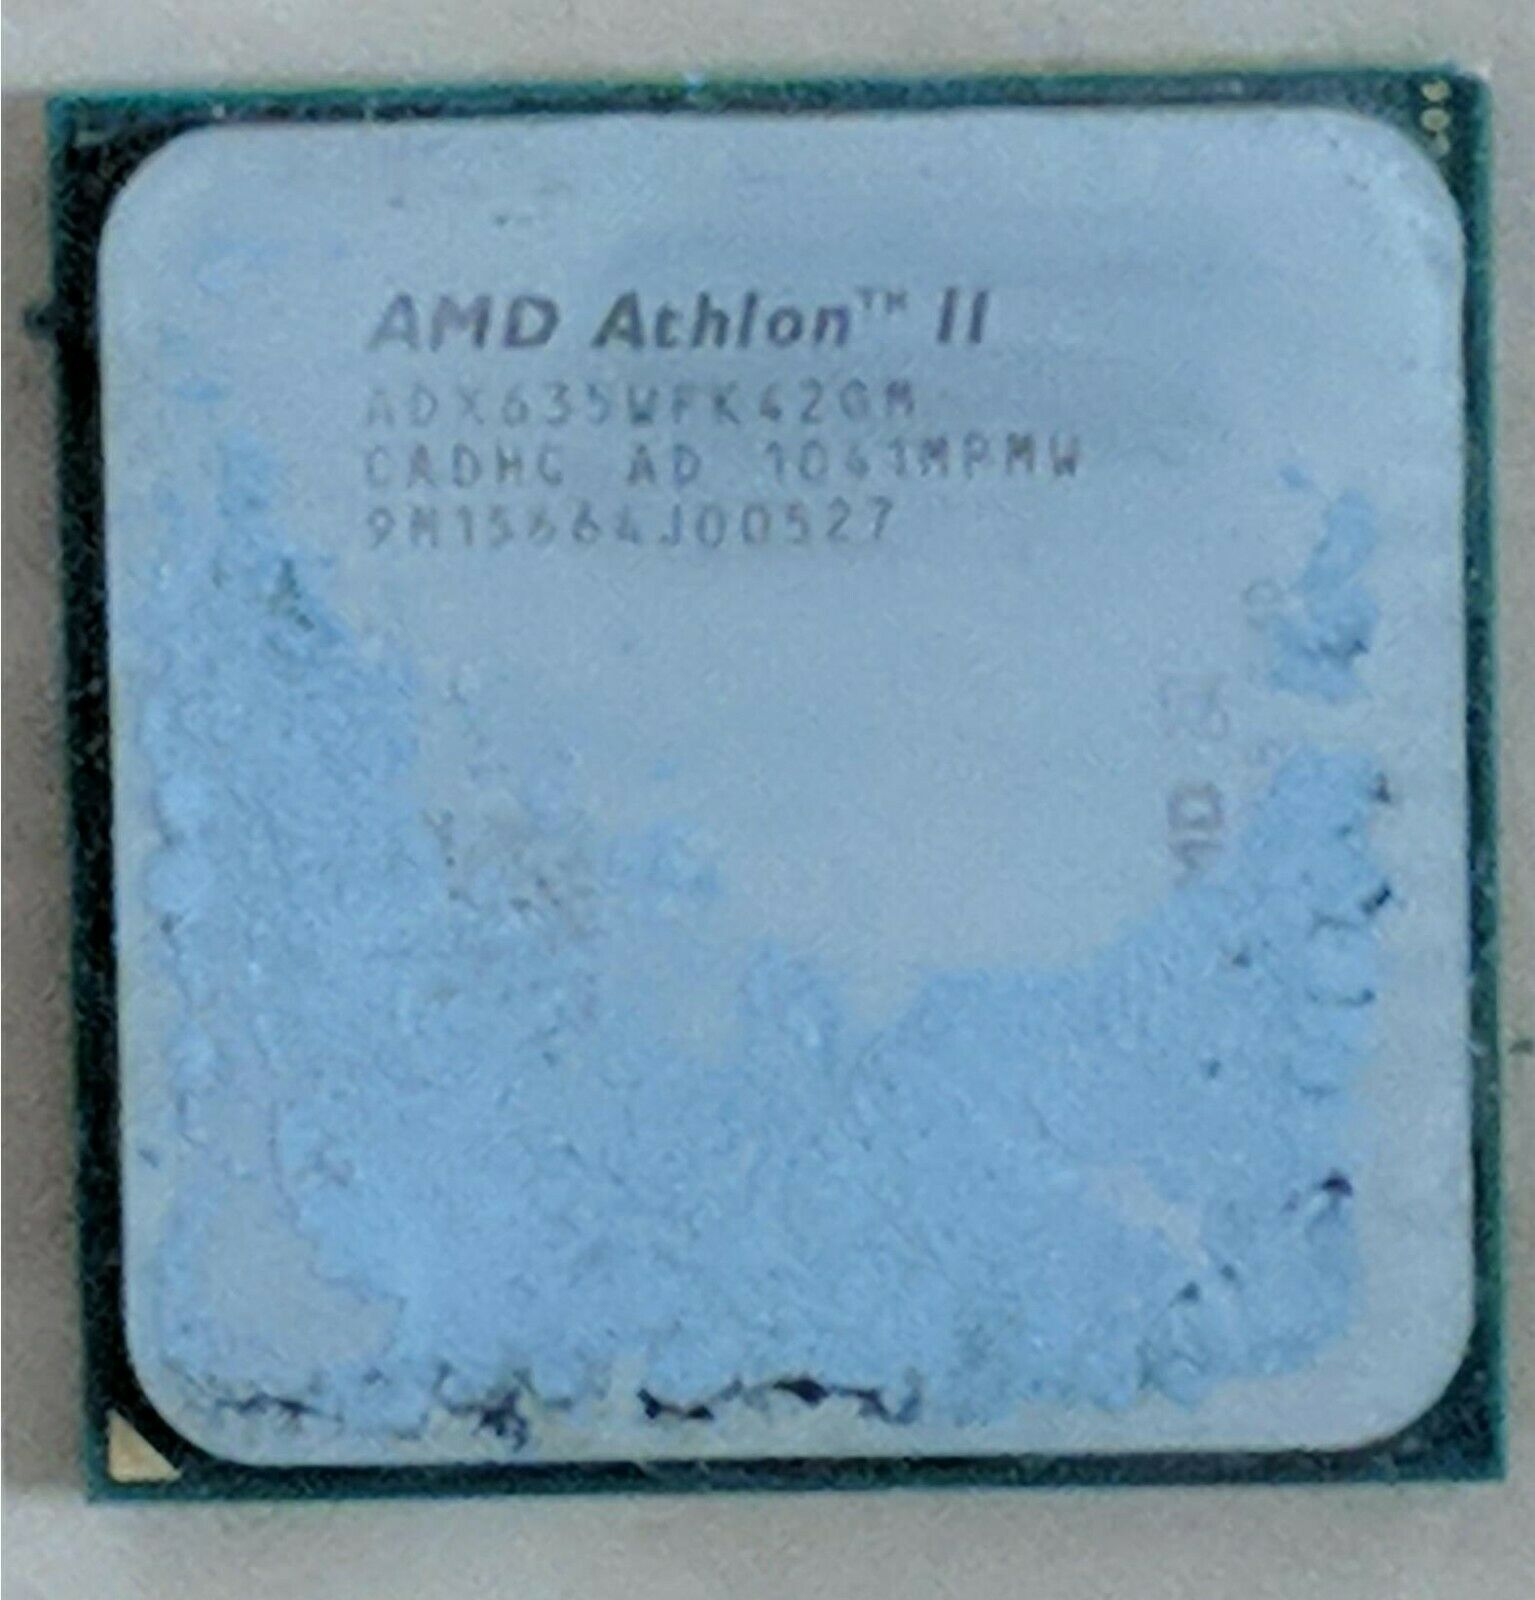 Amd Athlon Ii X4 635 2 9ghz Quad Core Adx635wfk42gi Processor For Sale Online Ebay